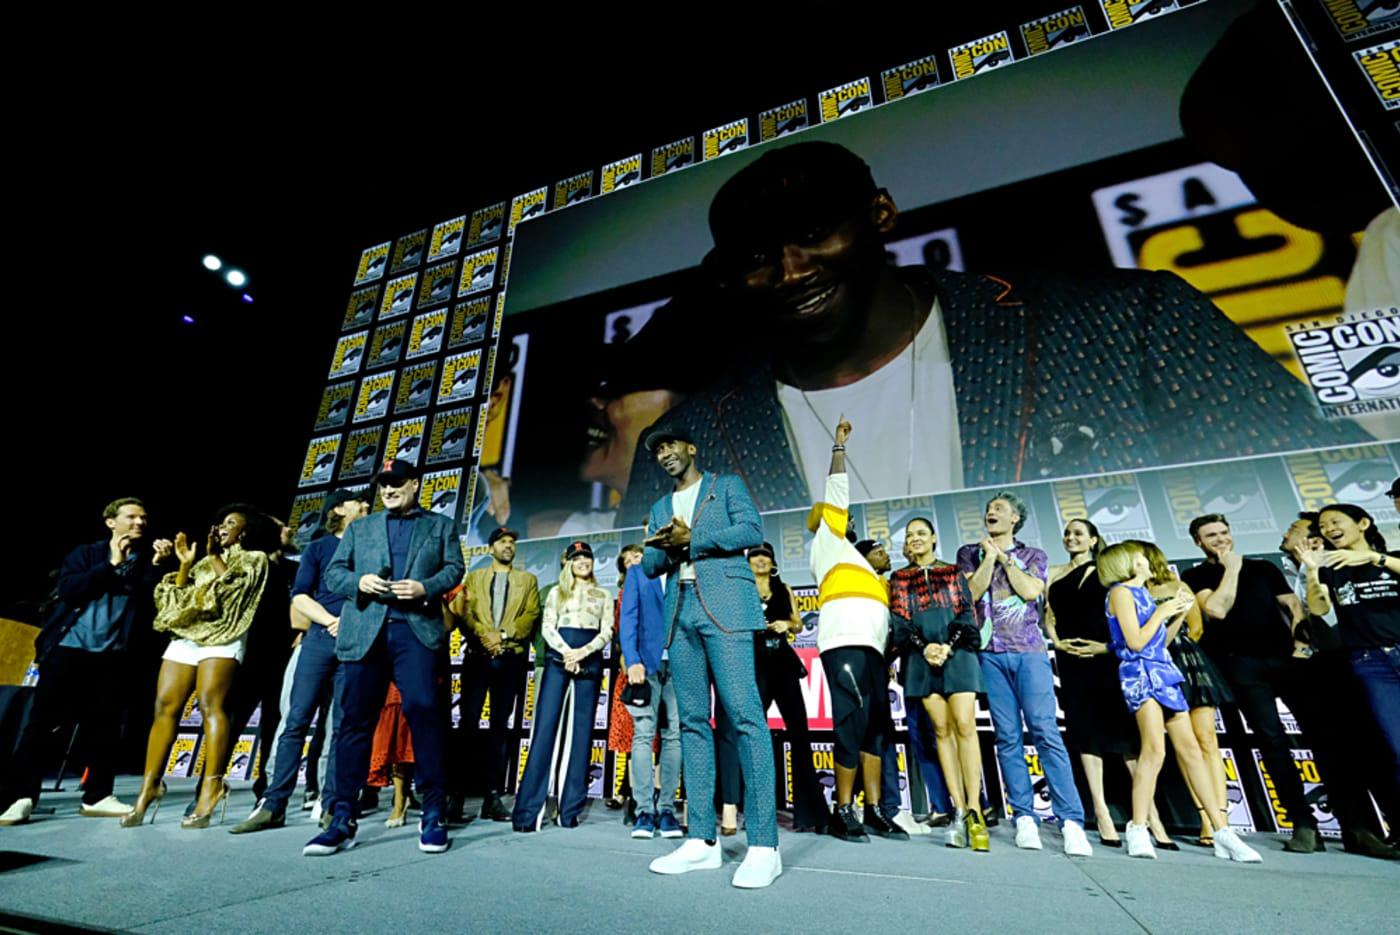 Mahershala Ali at Marvel Studios' Hall H Panel, Comic Con 2019